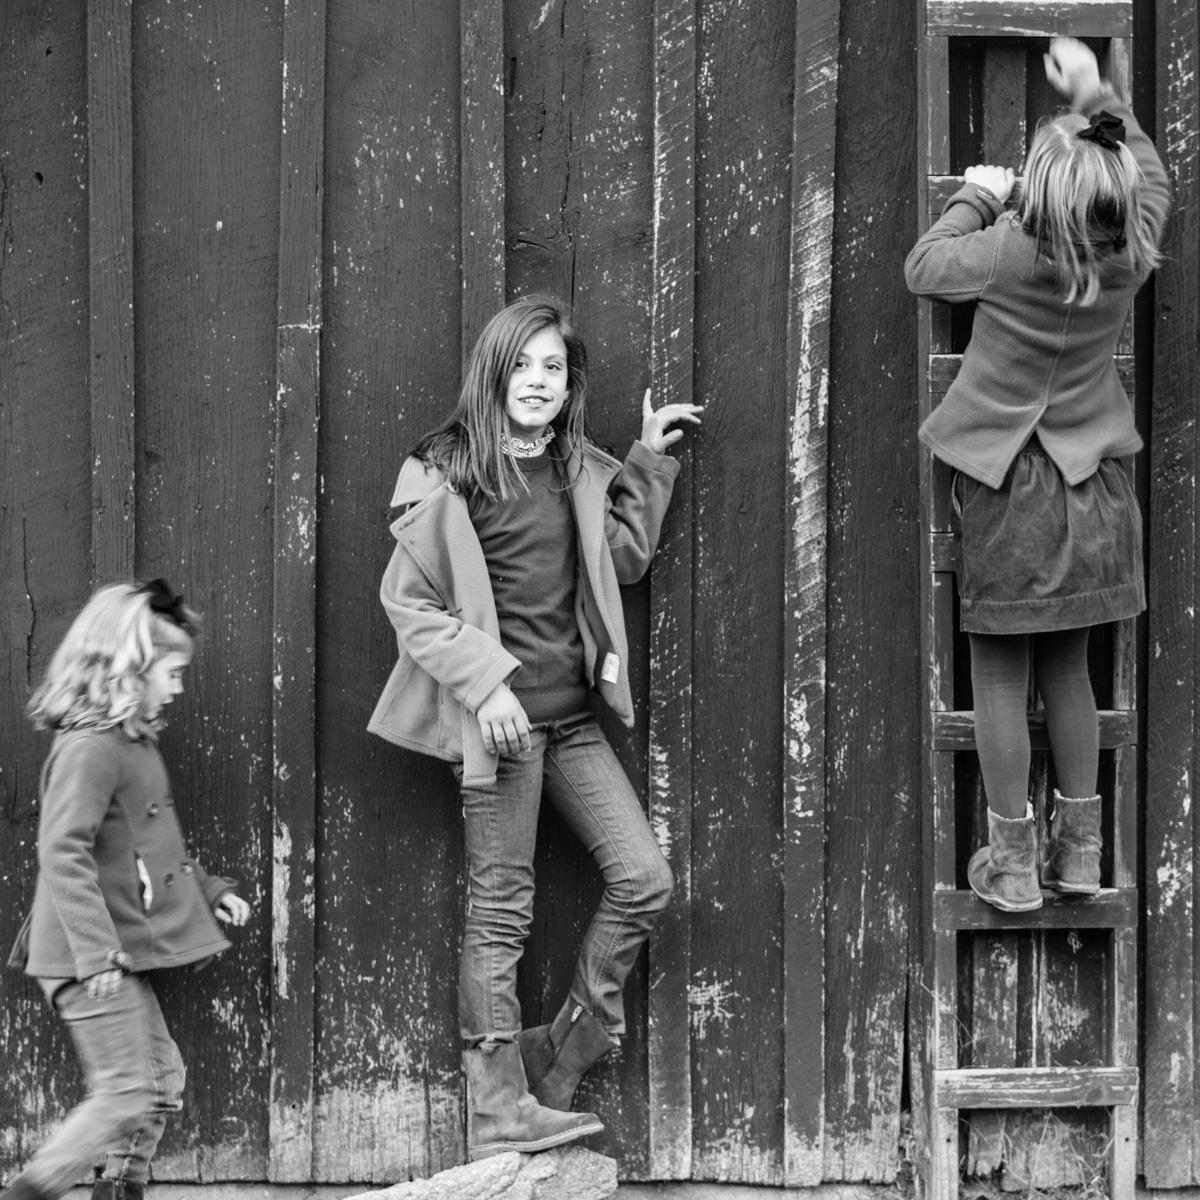 three-little-girls-barn-climbing-|megan-witt-photo.jpg